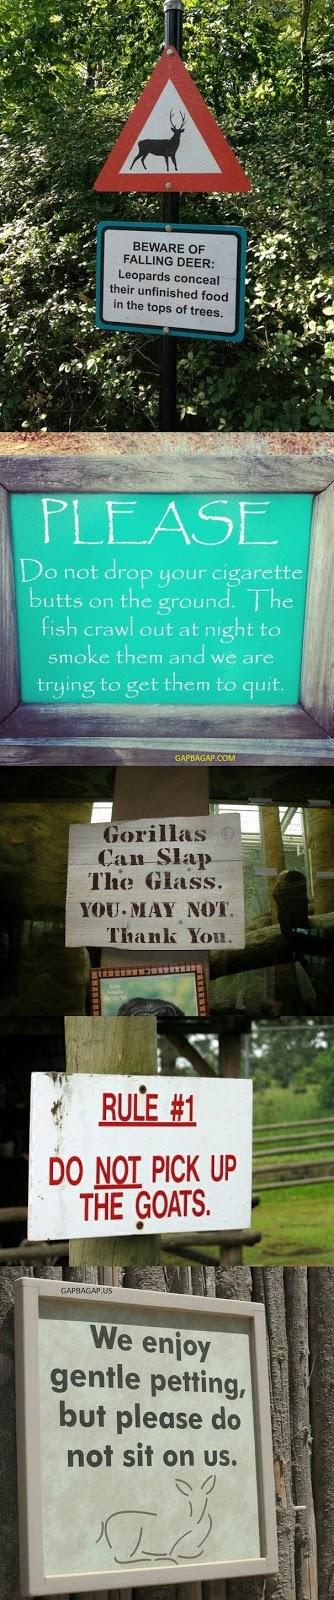 gap ba gap 10 funniest animal zoo signs